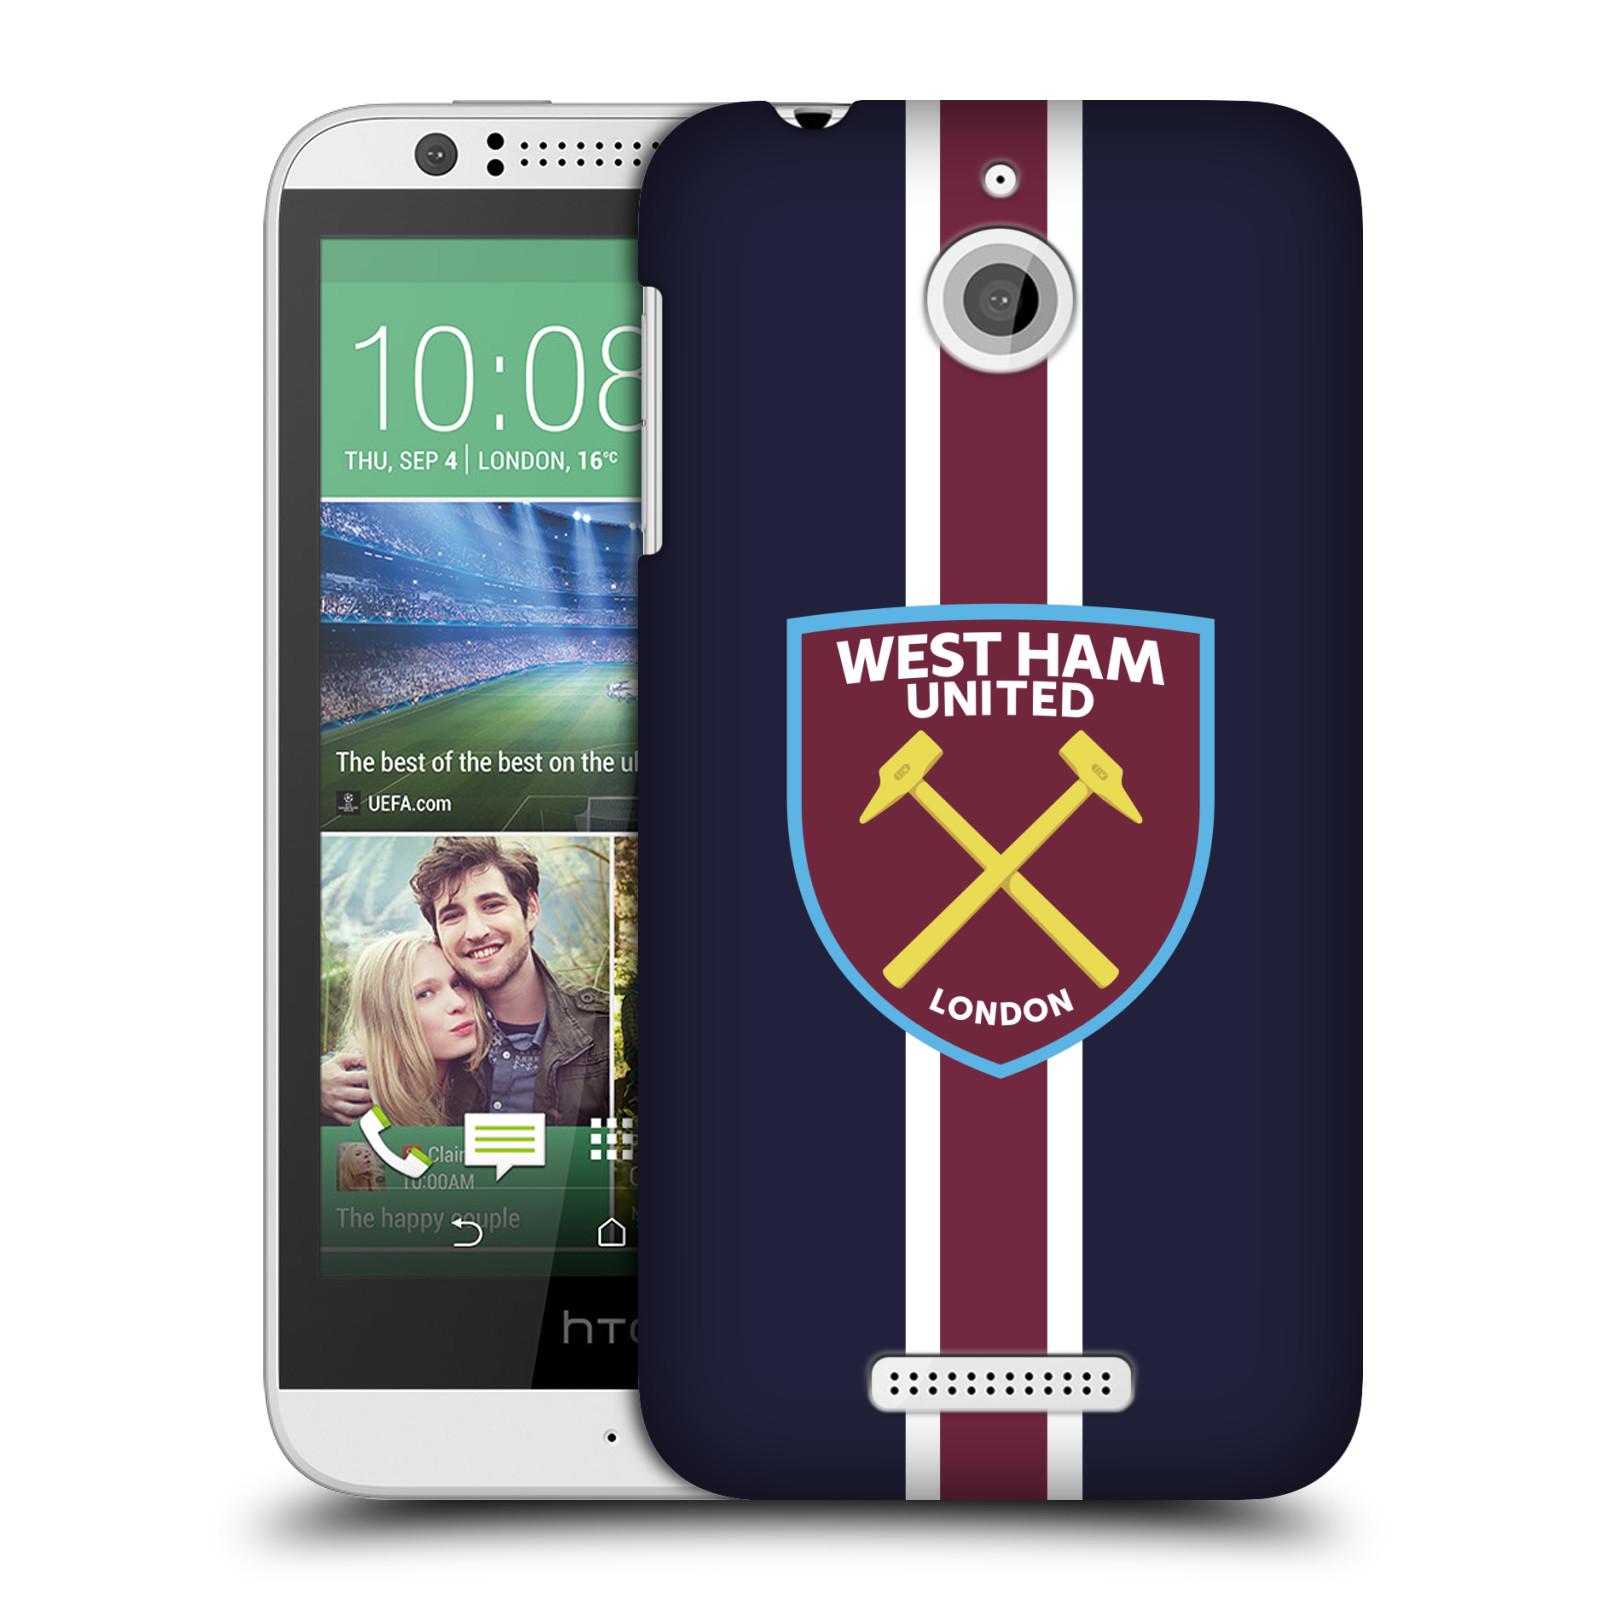 Plastové pouzdro na mobil HTC Desire 510 - Head Case - West Ham United - Pruhy